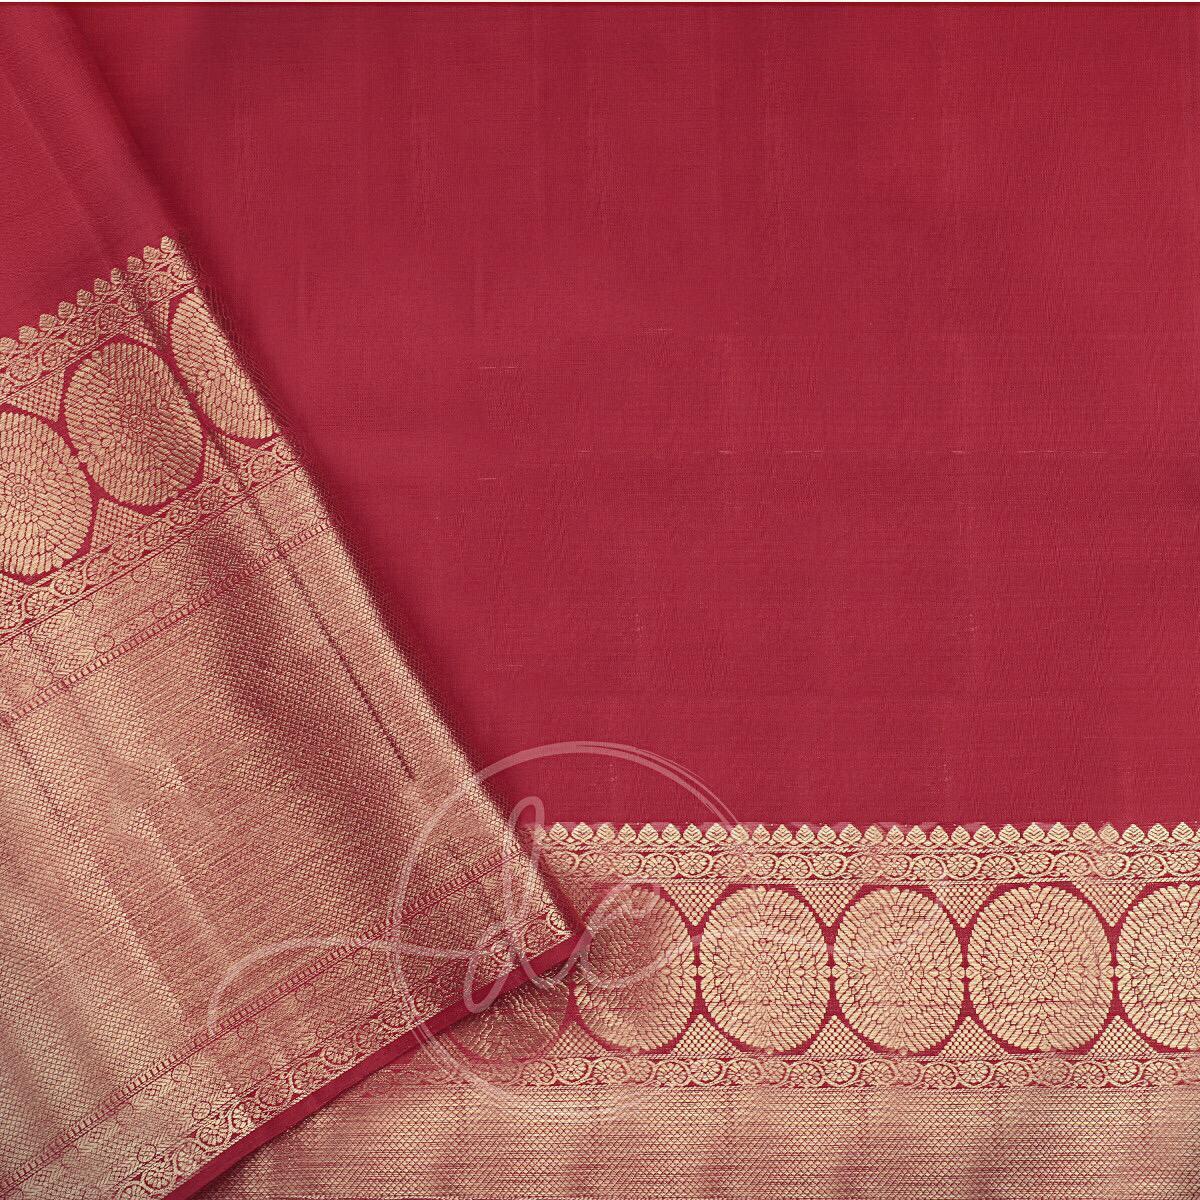 Latest Desiger Red Colour Kanchipuram Silk Saree